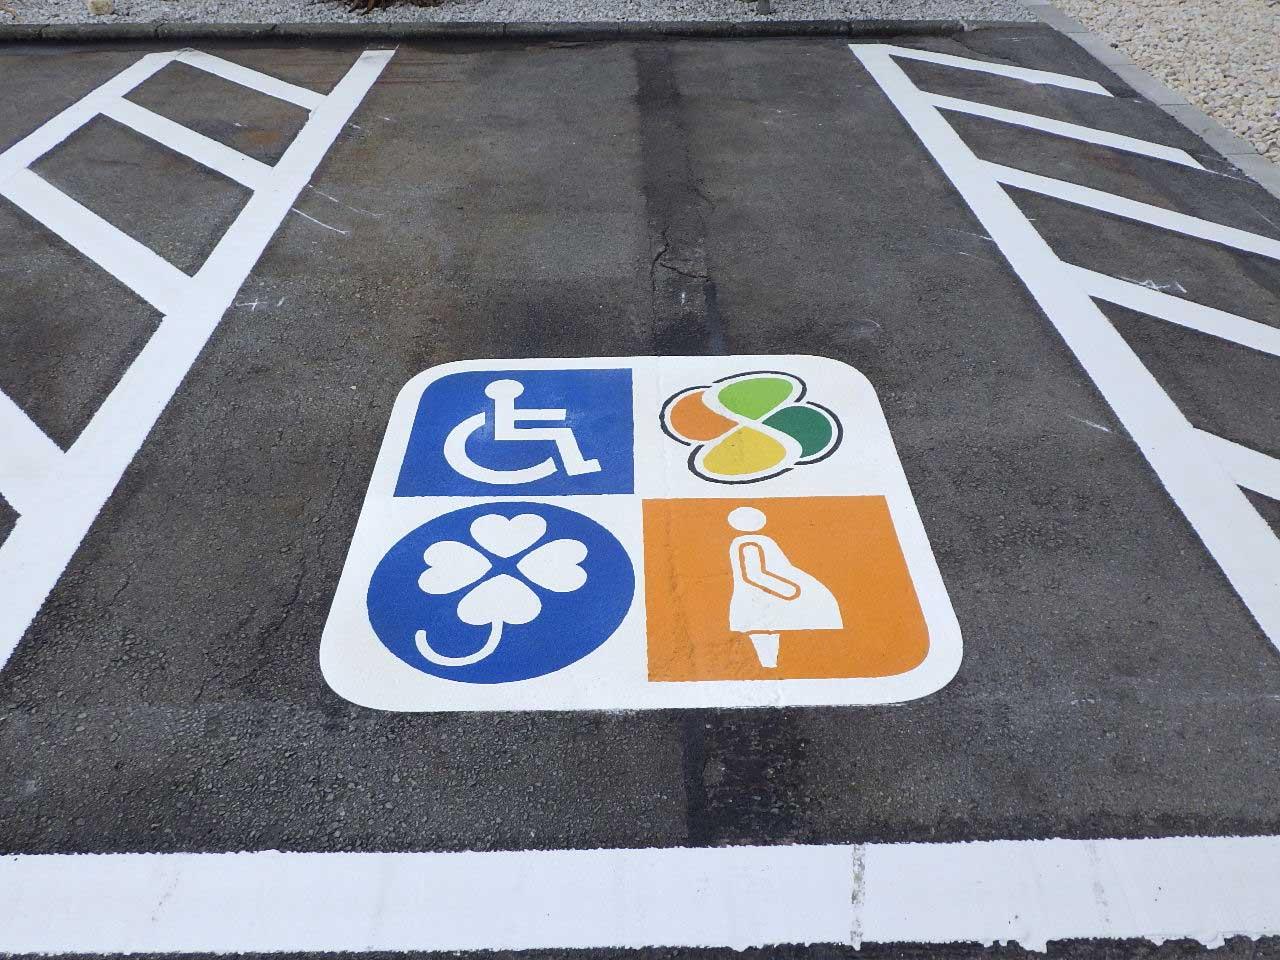 優先駐車マーク(複合型)